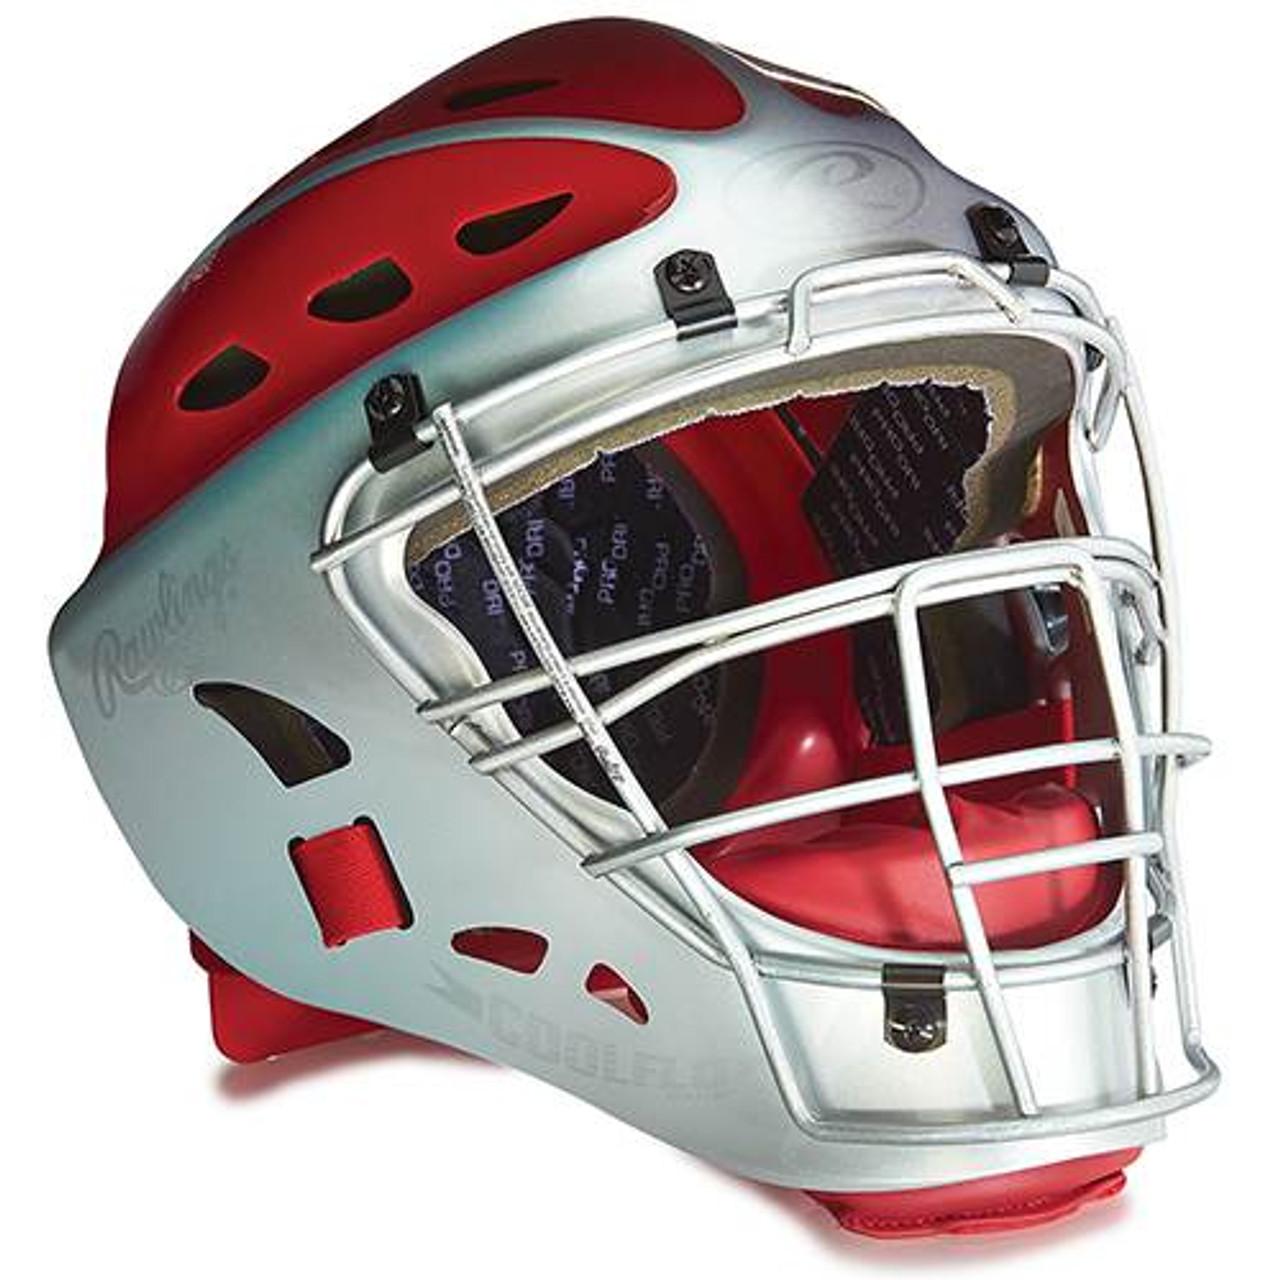 Youth Two-Tone Catcher's Helmet